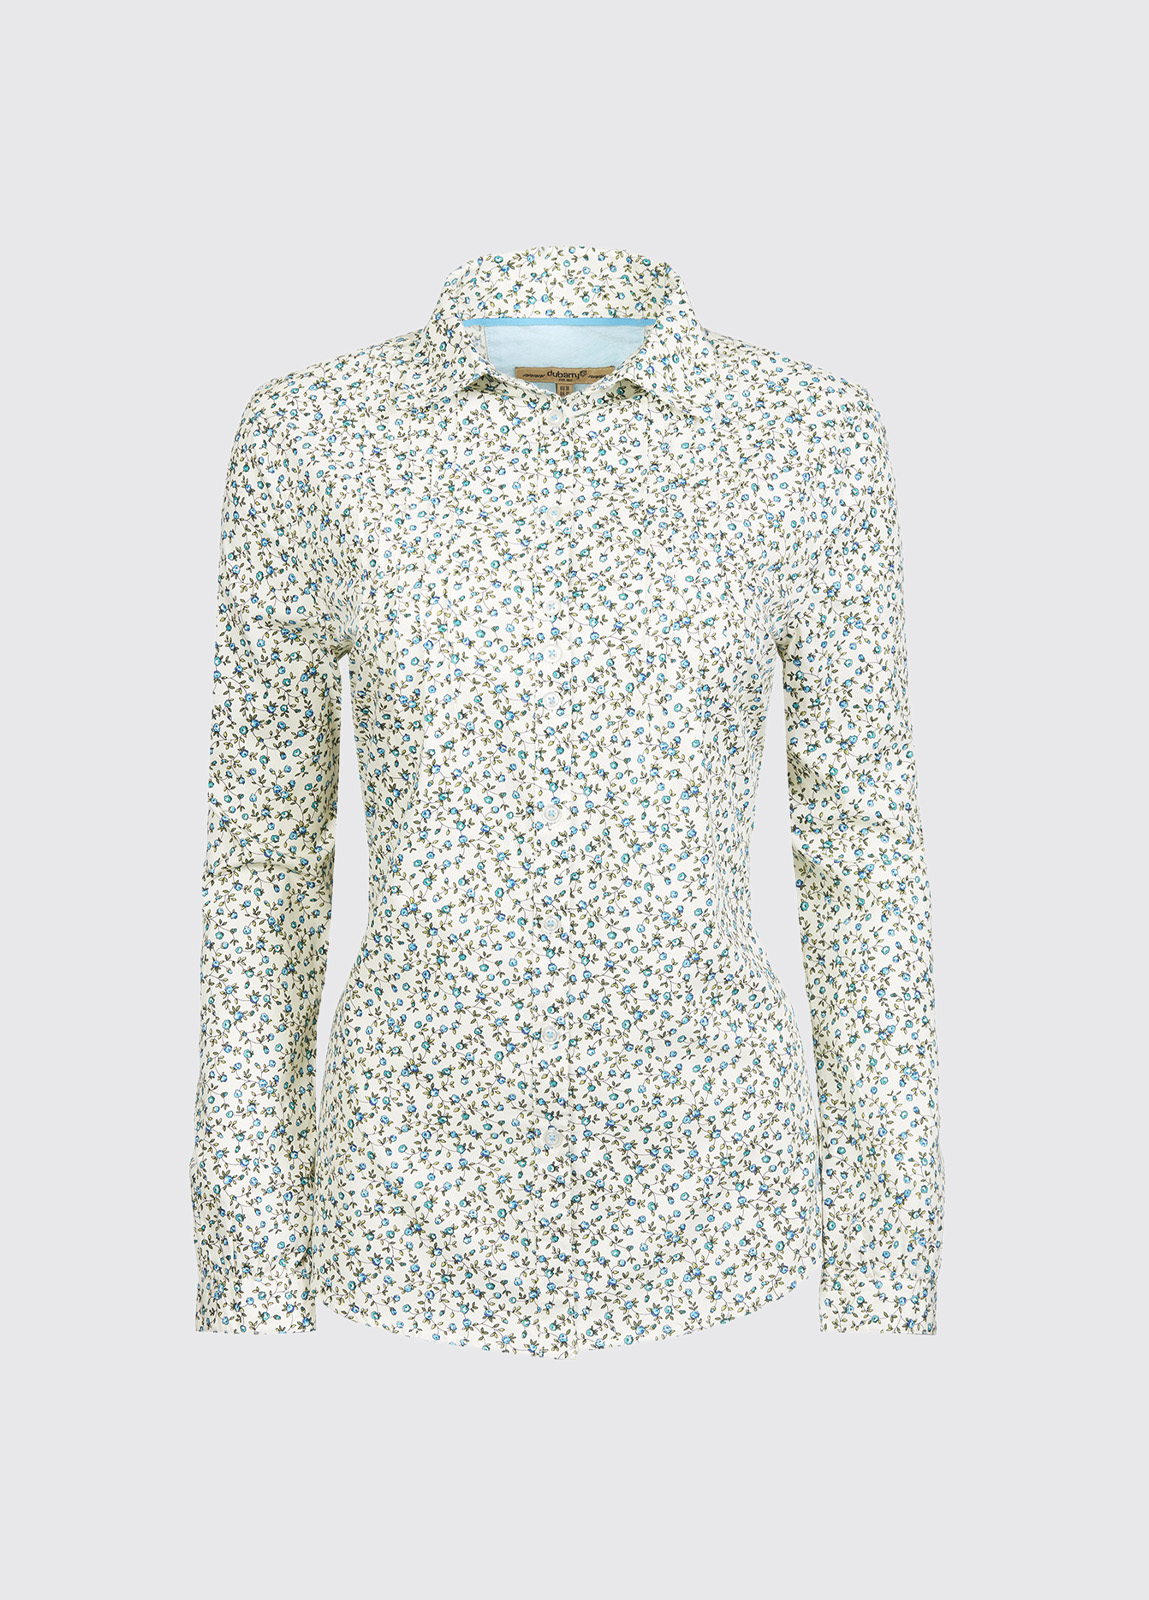 Brooklime Ladies Shirt - Teal Multi